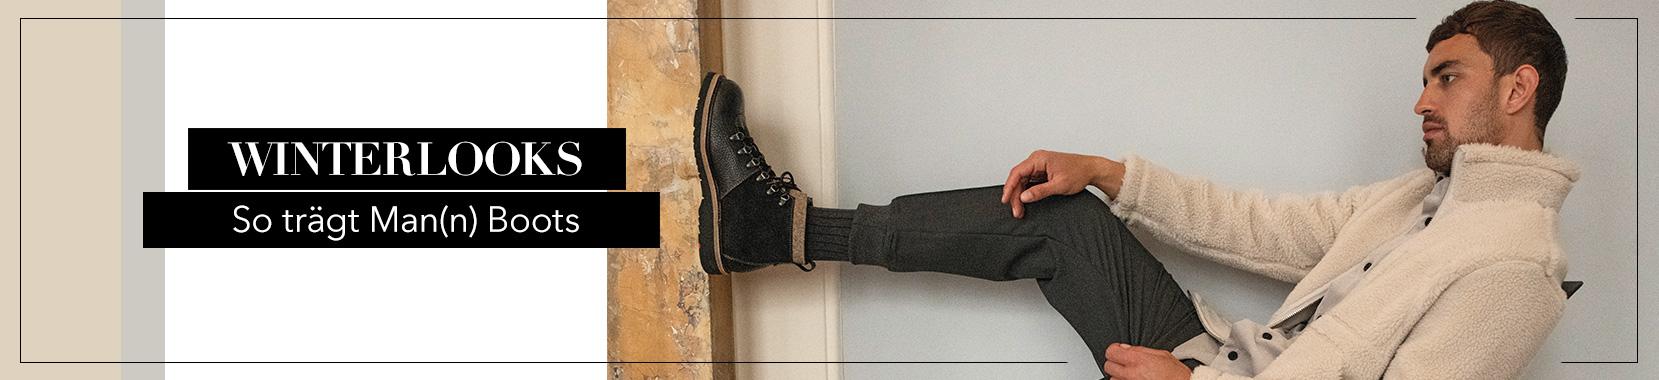 Herren Winterlooks - So trägt Man(n) Boots